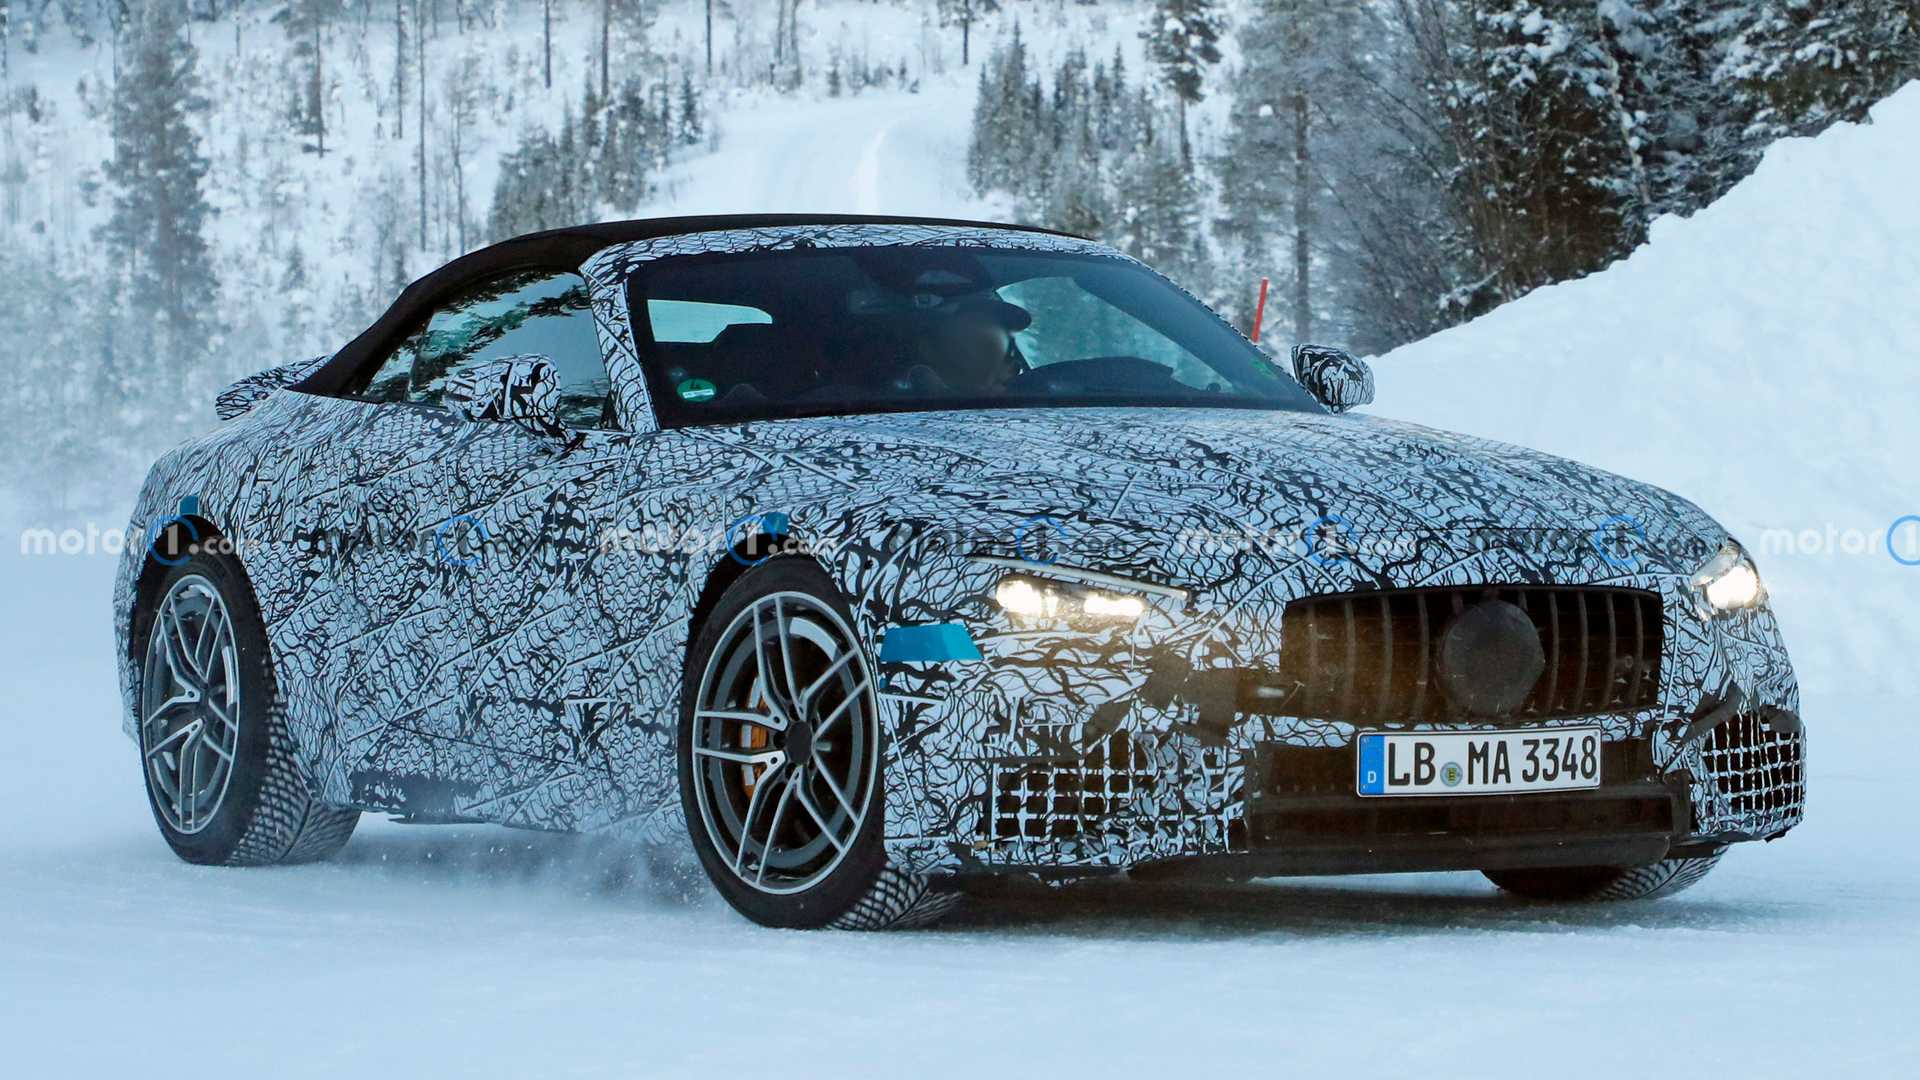 Флот Mercedes SL 2022 года замечен в снежном дне в Швеции